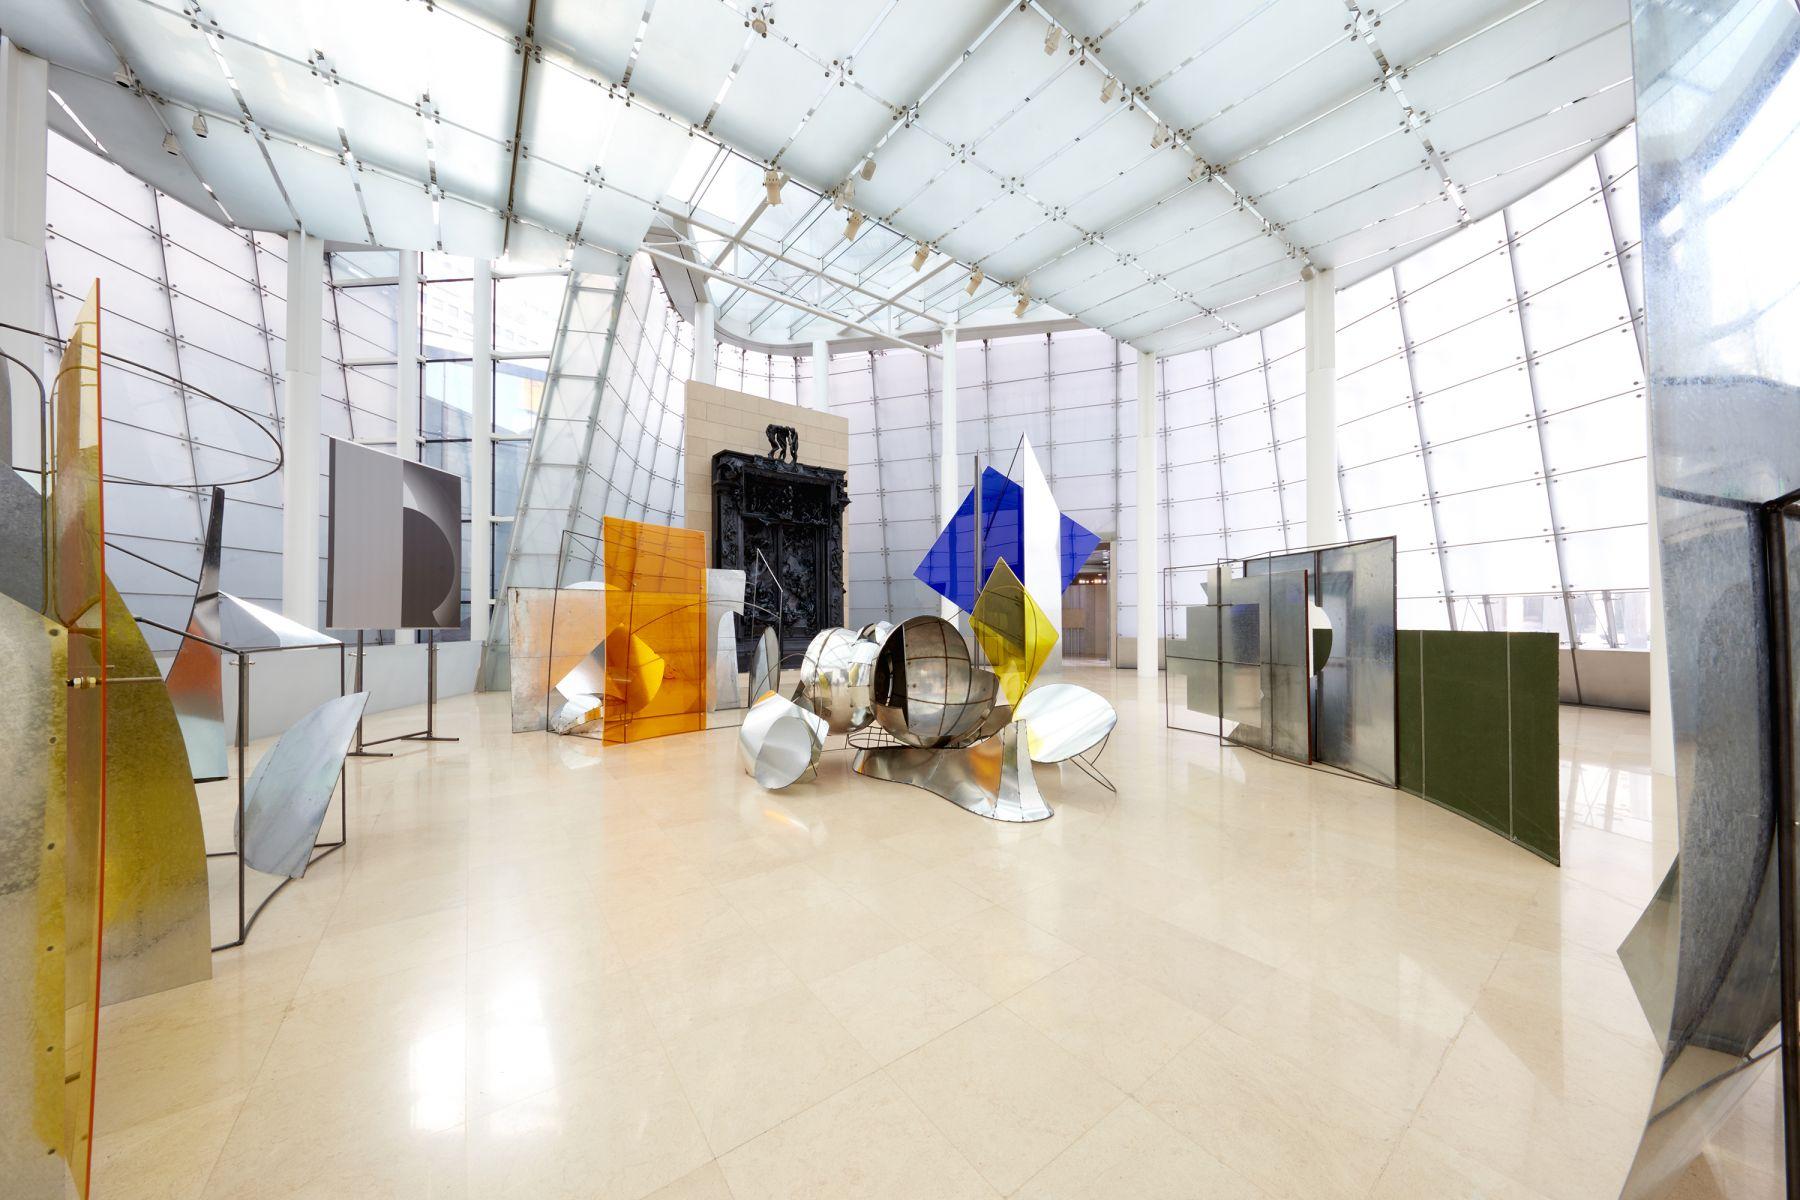 Liu Wei, Panorama, Installation view, PLATEAU Samsung Museum of Art, Seoul